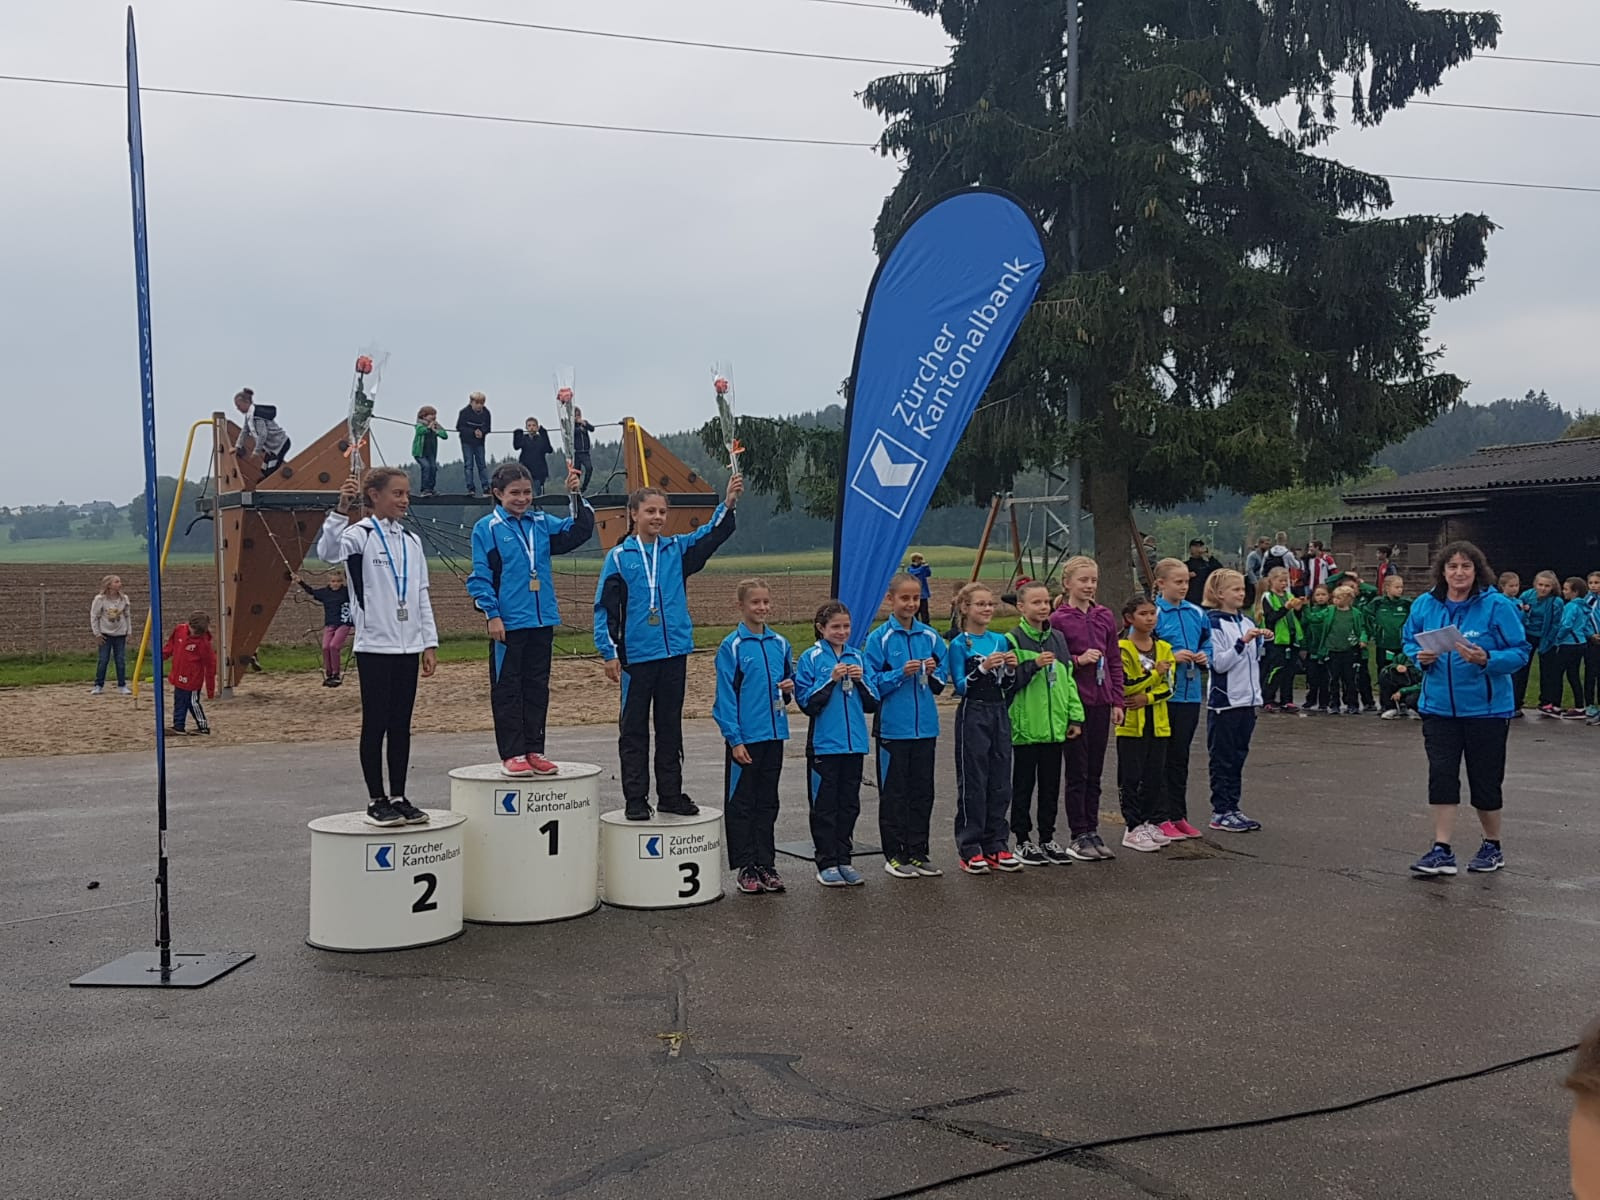 Zürcher Kantonale Gerätemeisterschaften Effretikon